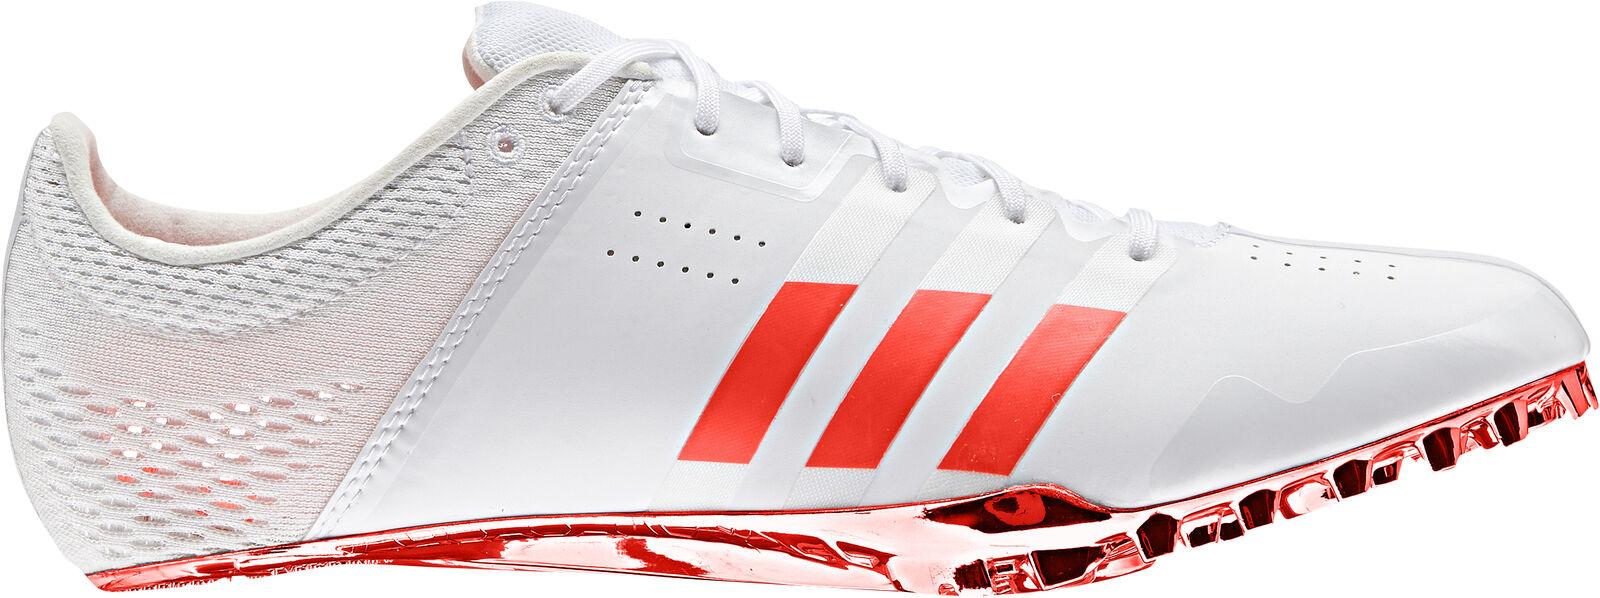 Adidas Adizero Rio Prime Finesse Running Spikes - White